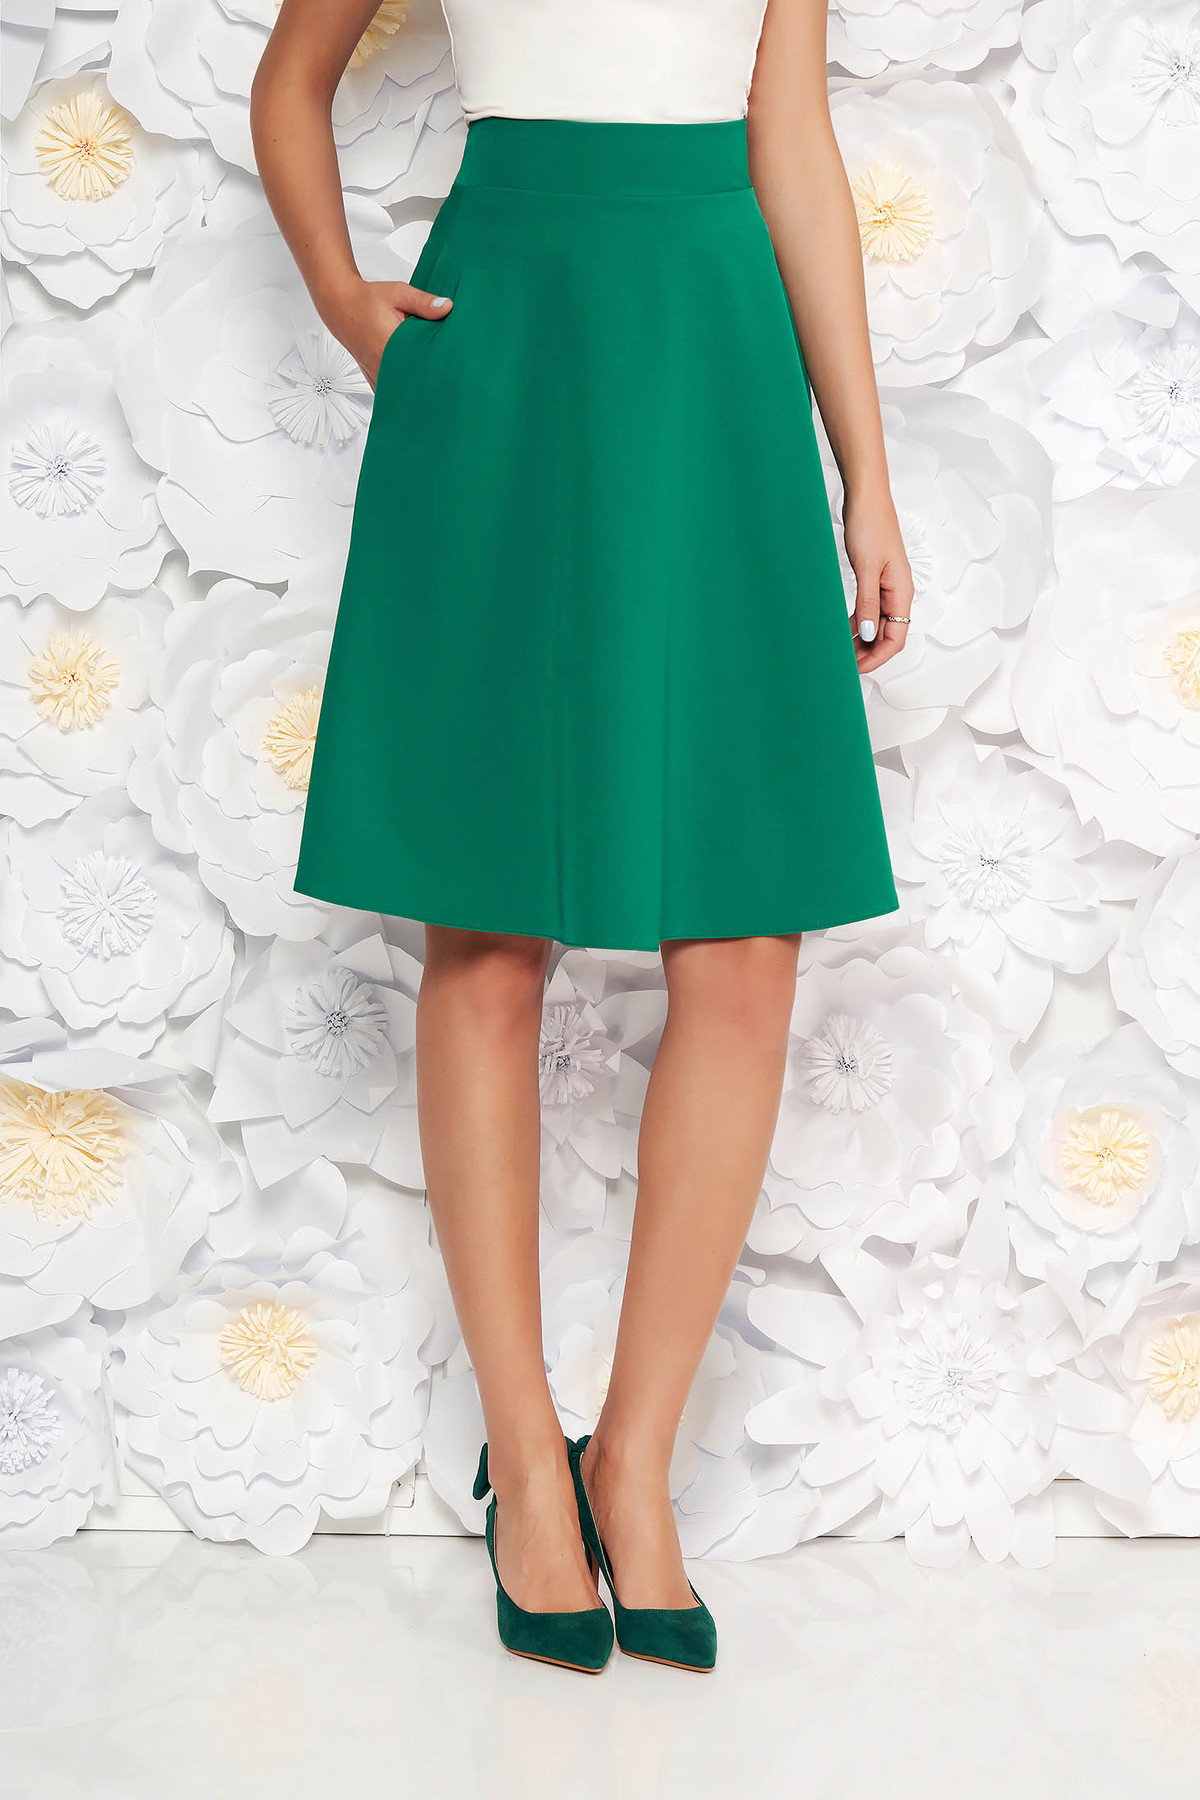 Fusta StarShinerS verde eleganta in clos cu talie inalta din stofa usor elastica office